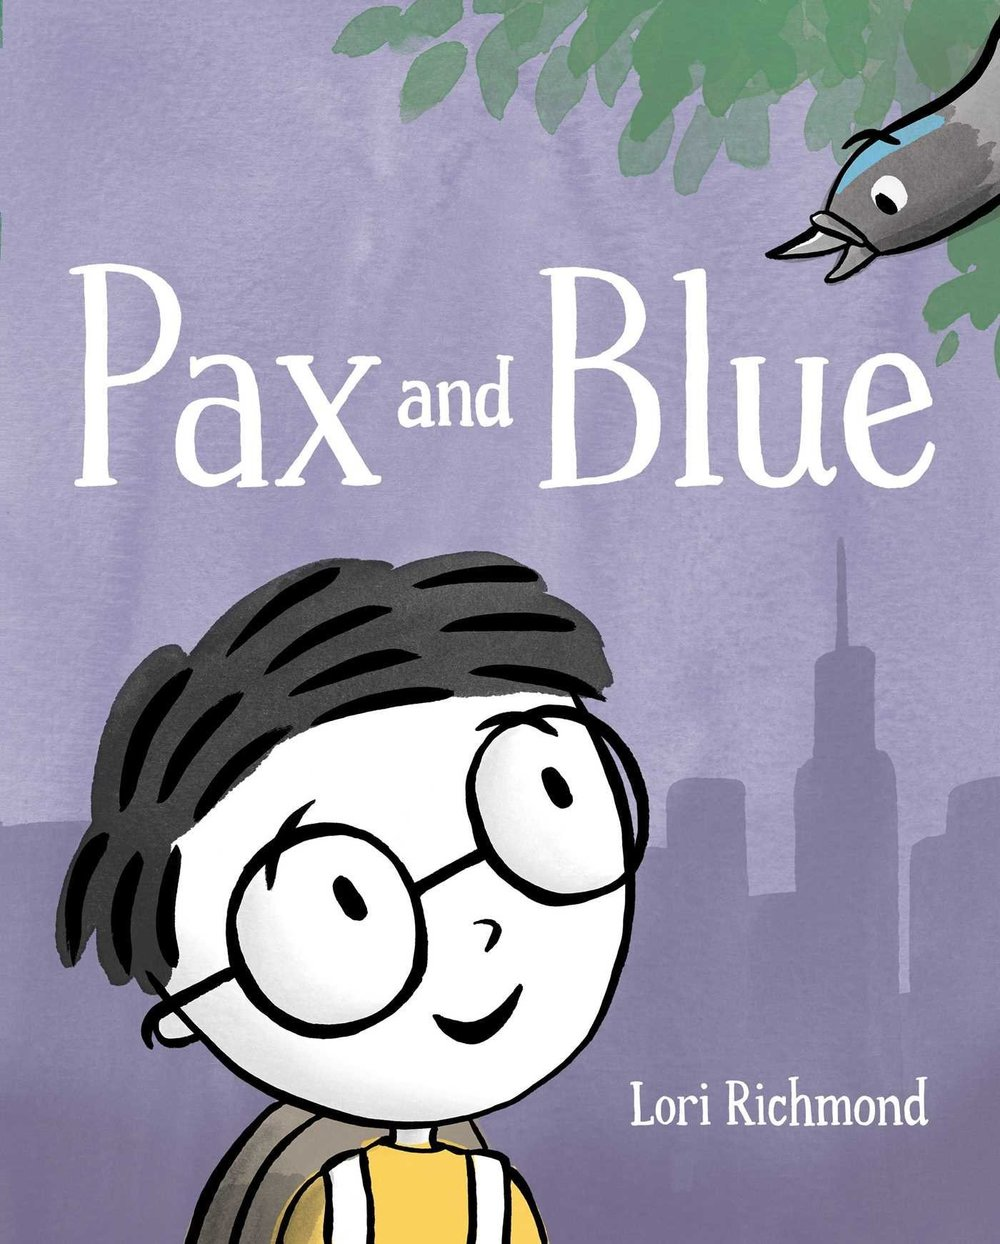 Richmond, Lori 2017_03 PAX AND BLUE - PB - RLM LK.jpg